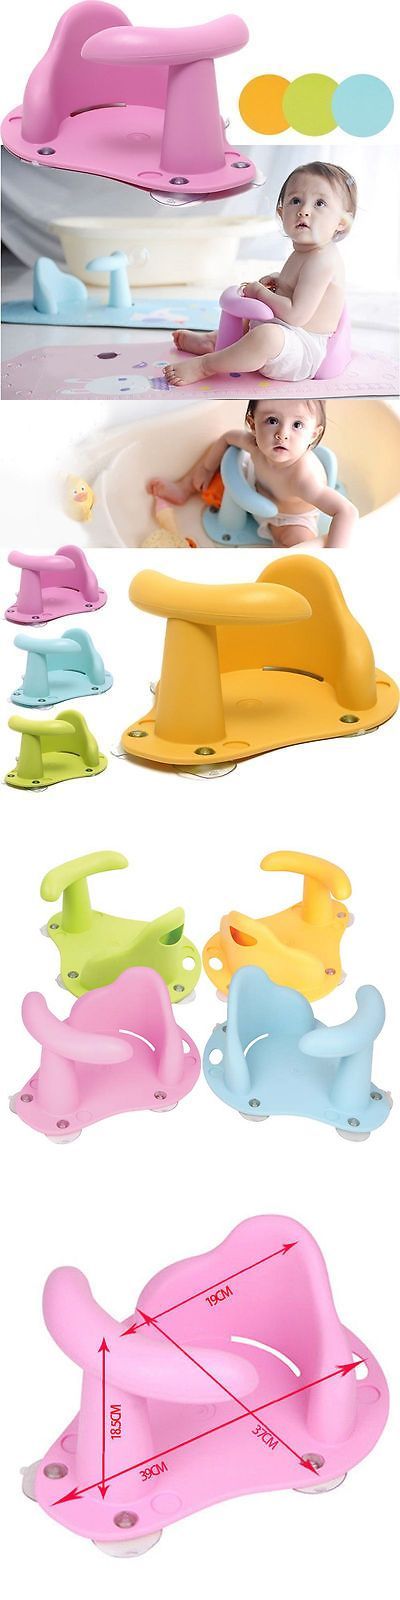 Bath Tub Seats and Rings 162024: Baby Infant Ring Seatbath Tub Bath ...